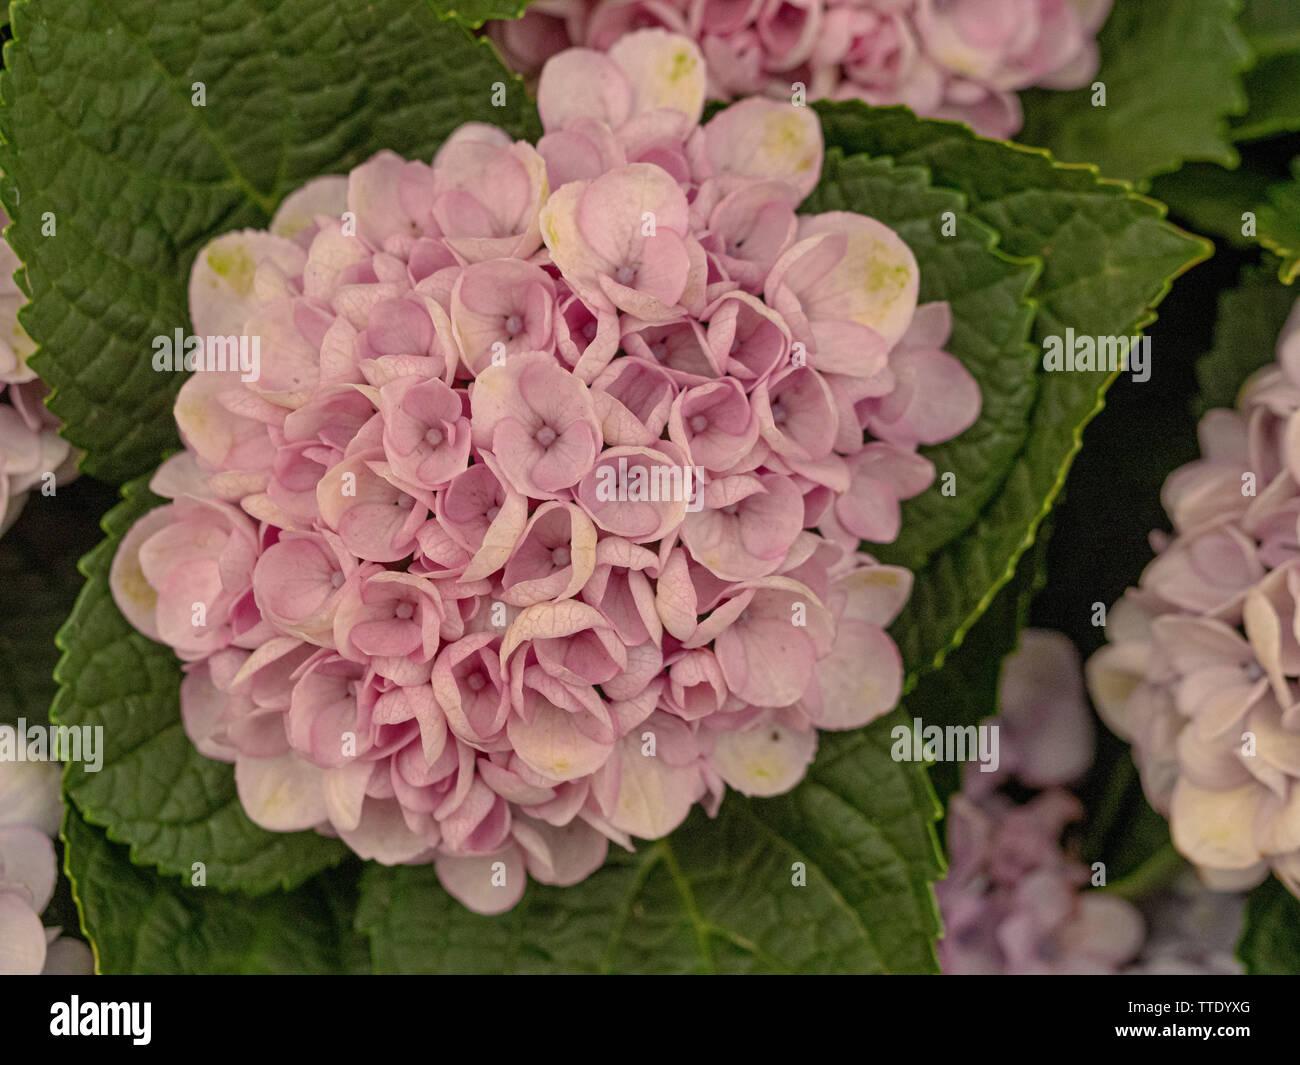 Hydrangea Macrophylla Stock Photos Hydrangea Macrophylla Stock